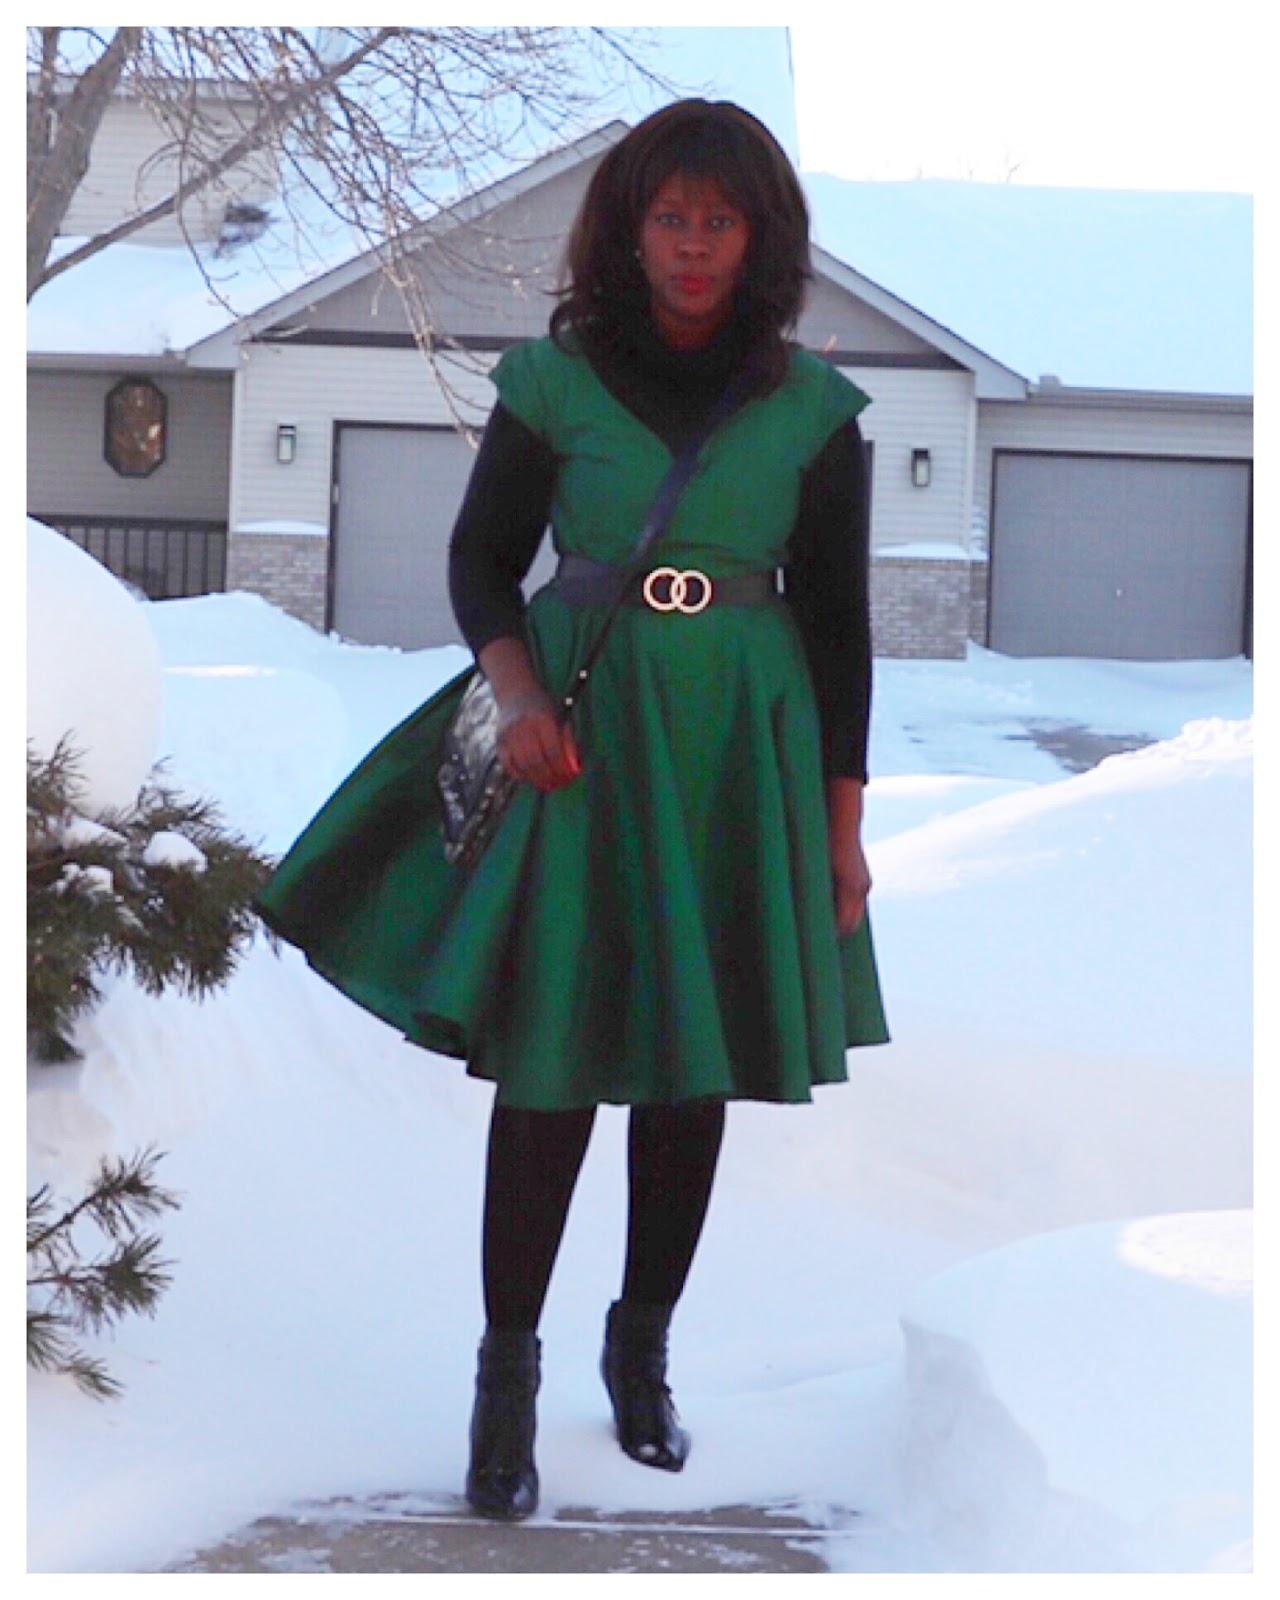 Fashion Beauty Zone: Beauty's Fashion Zone: Green Dupioni Midi Dress + Ankle Boots